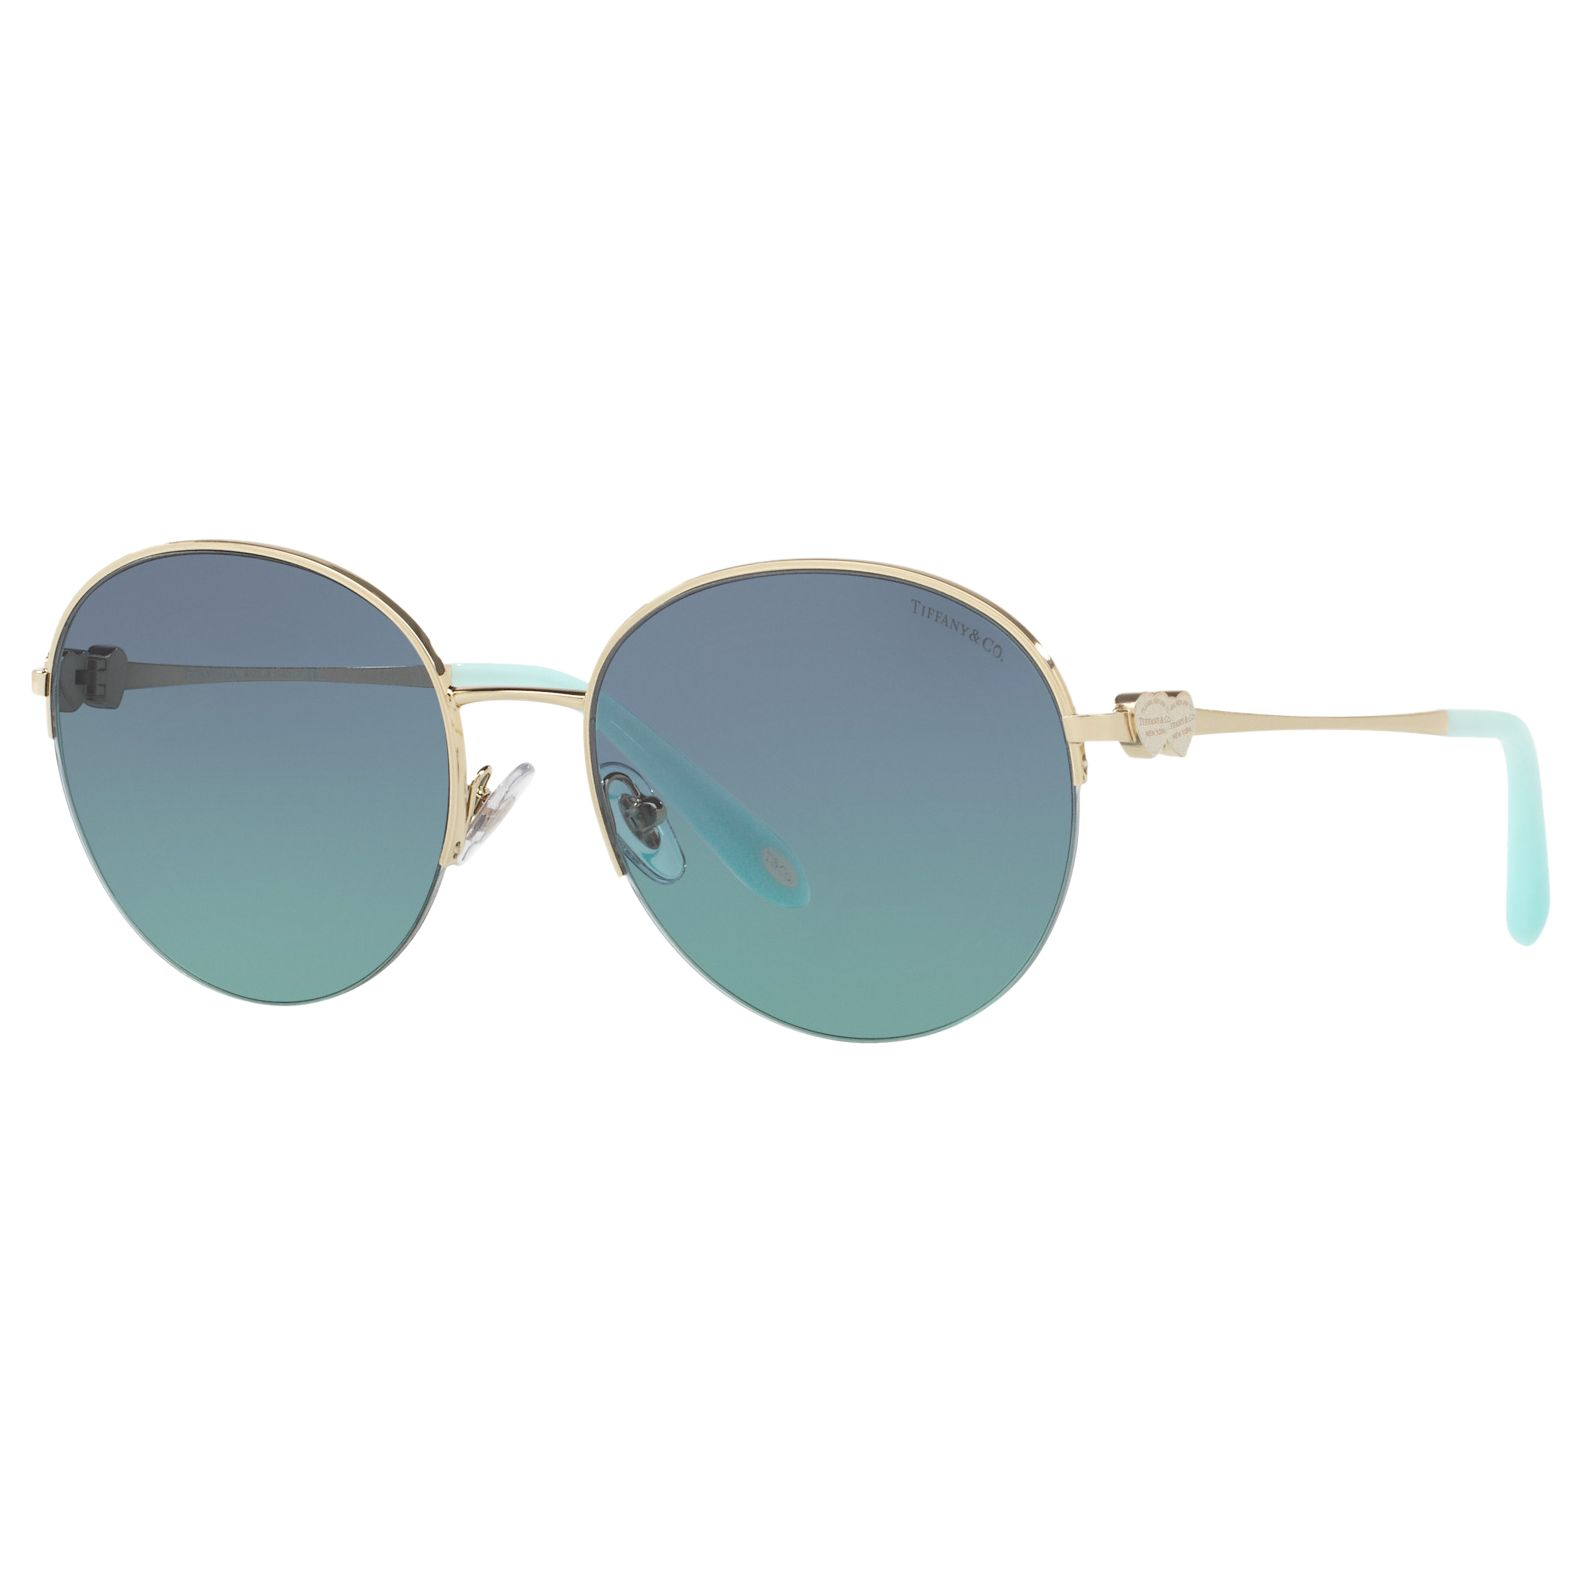 Tiffany & Co Tiffany & Co TF3053 Round Sunglasses, Gold/Blue Gradient